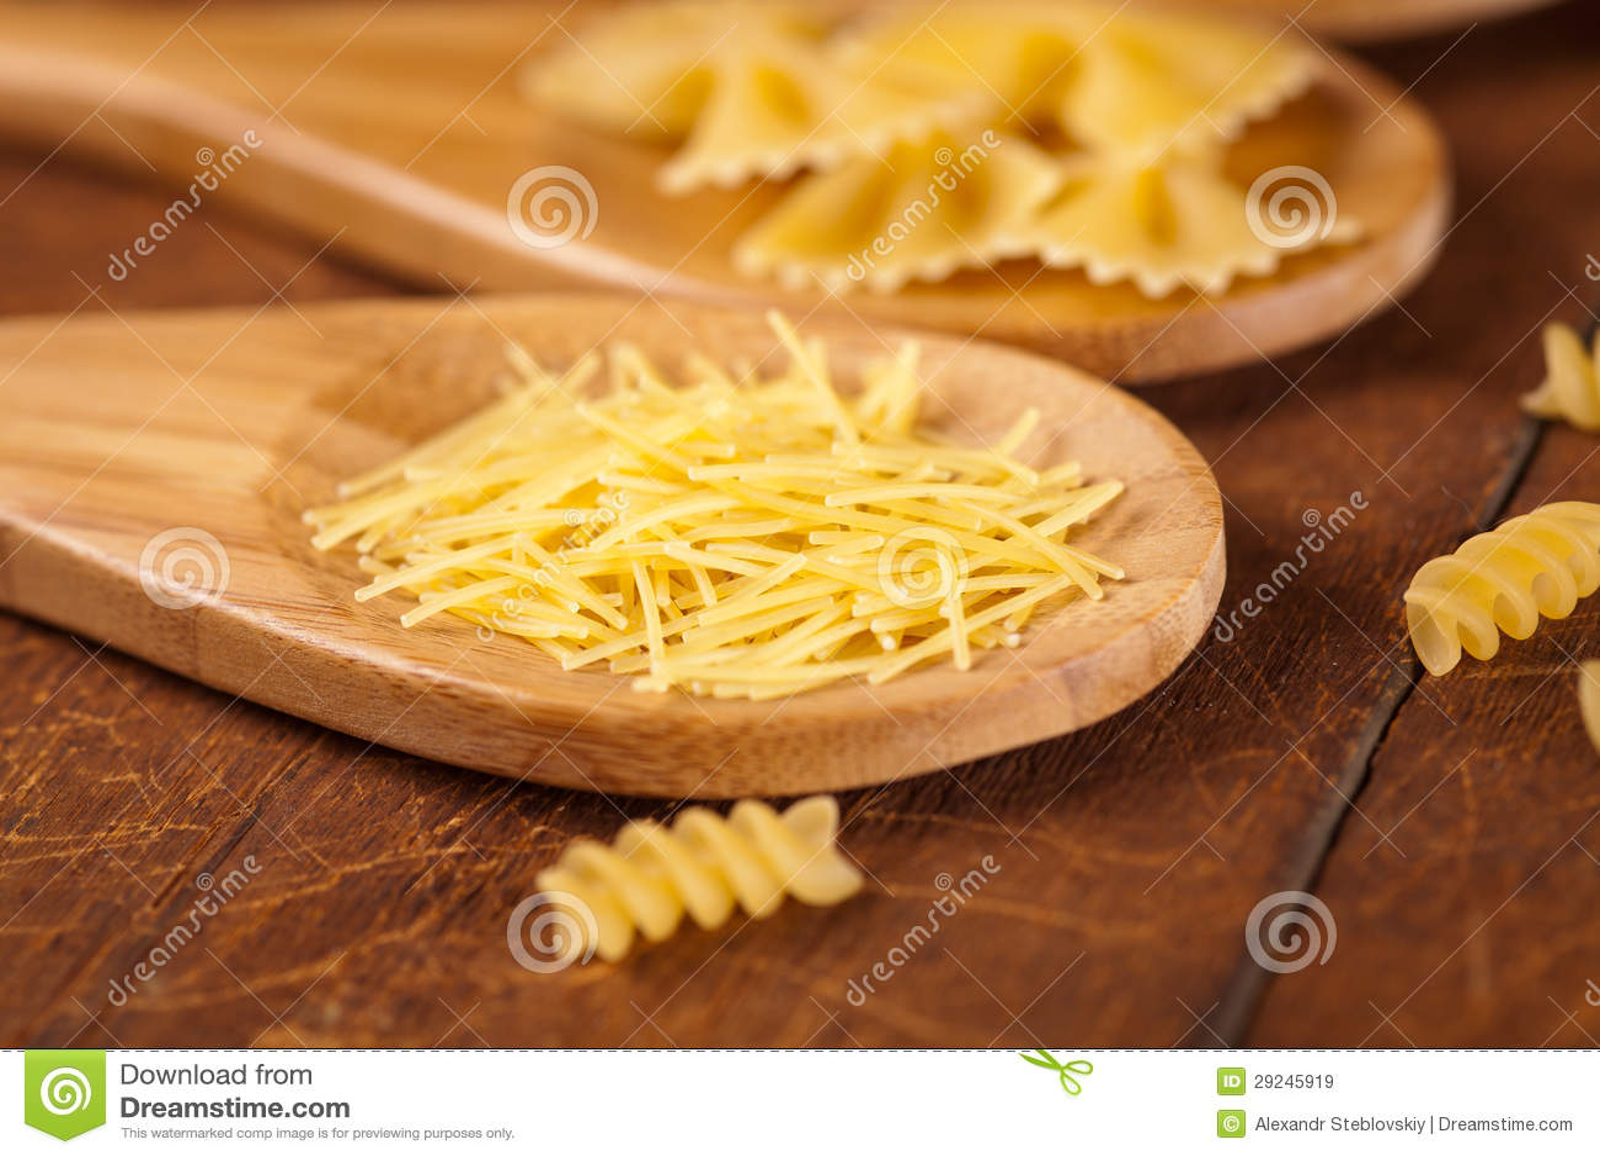 Download Espaguetes imagem de stock. Imagem de colher, espaguete - 29245919